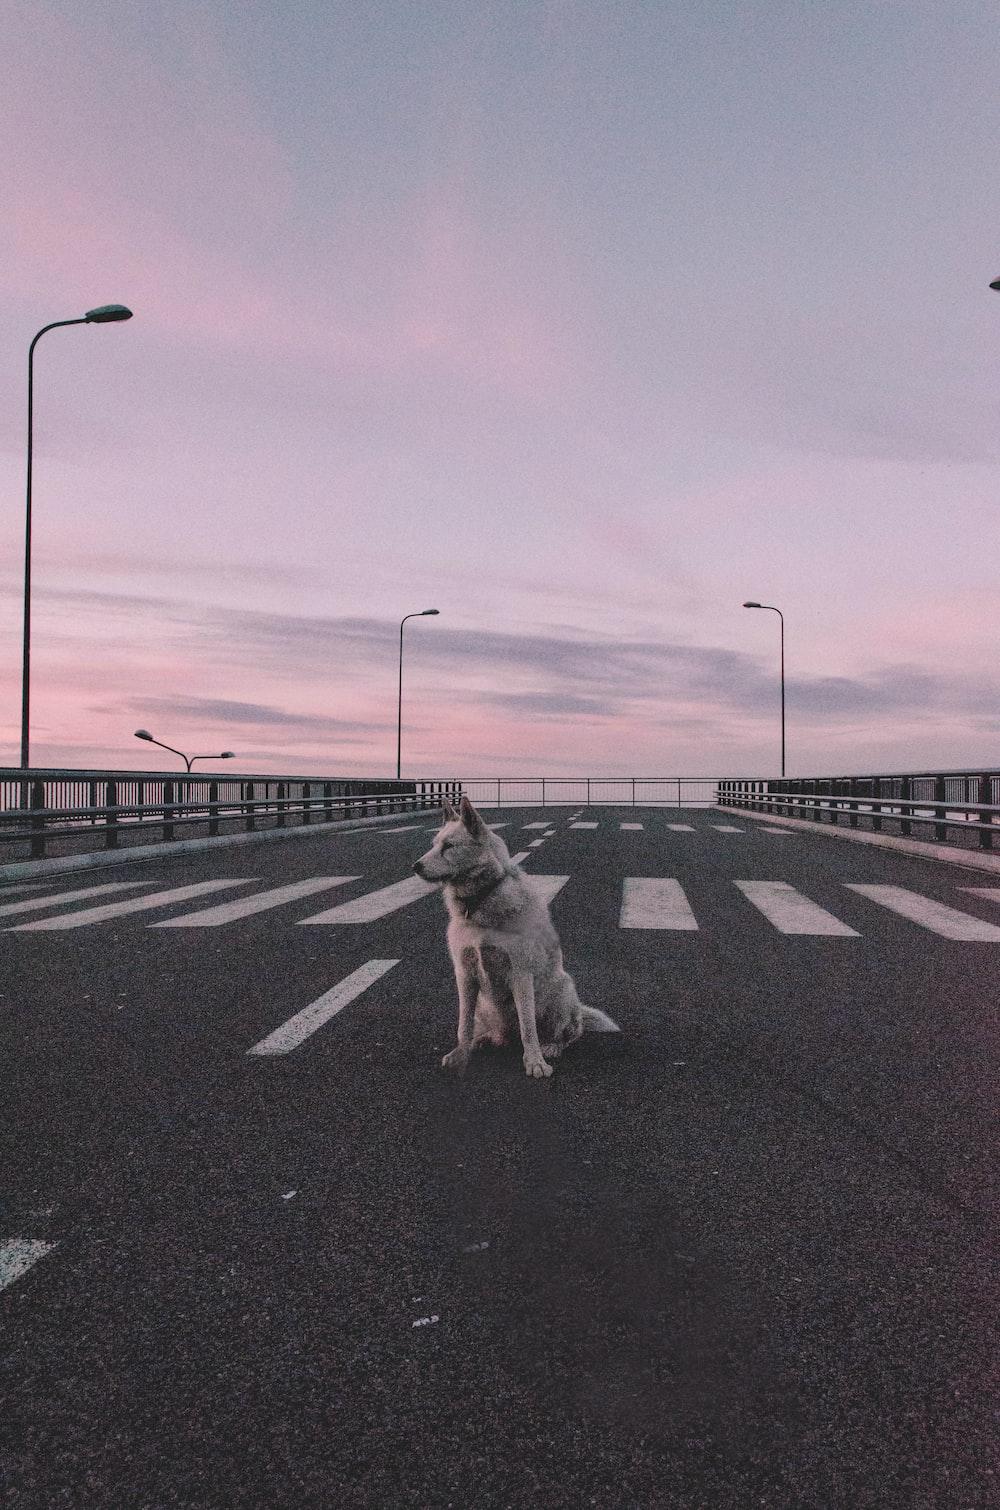 white dog sitting on road during daytime